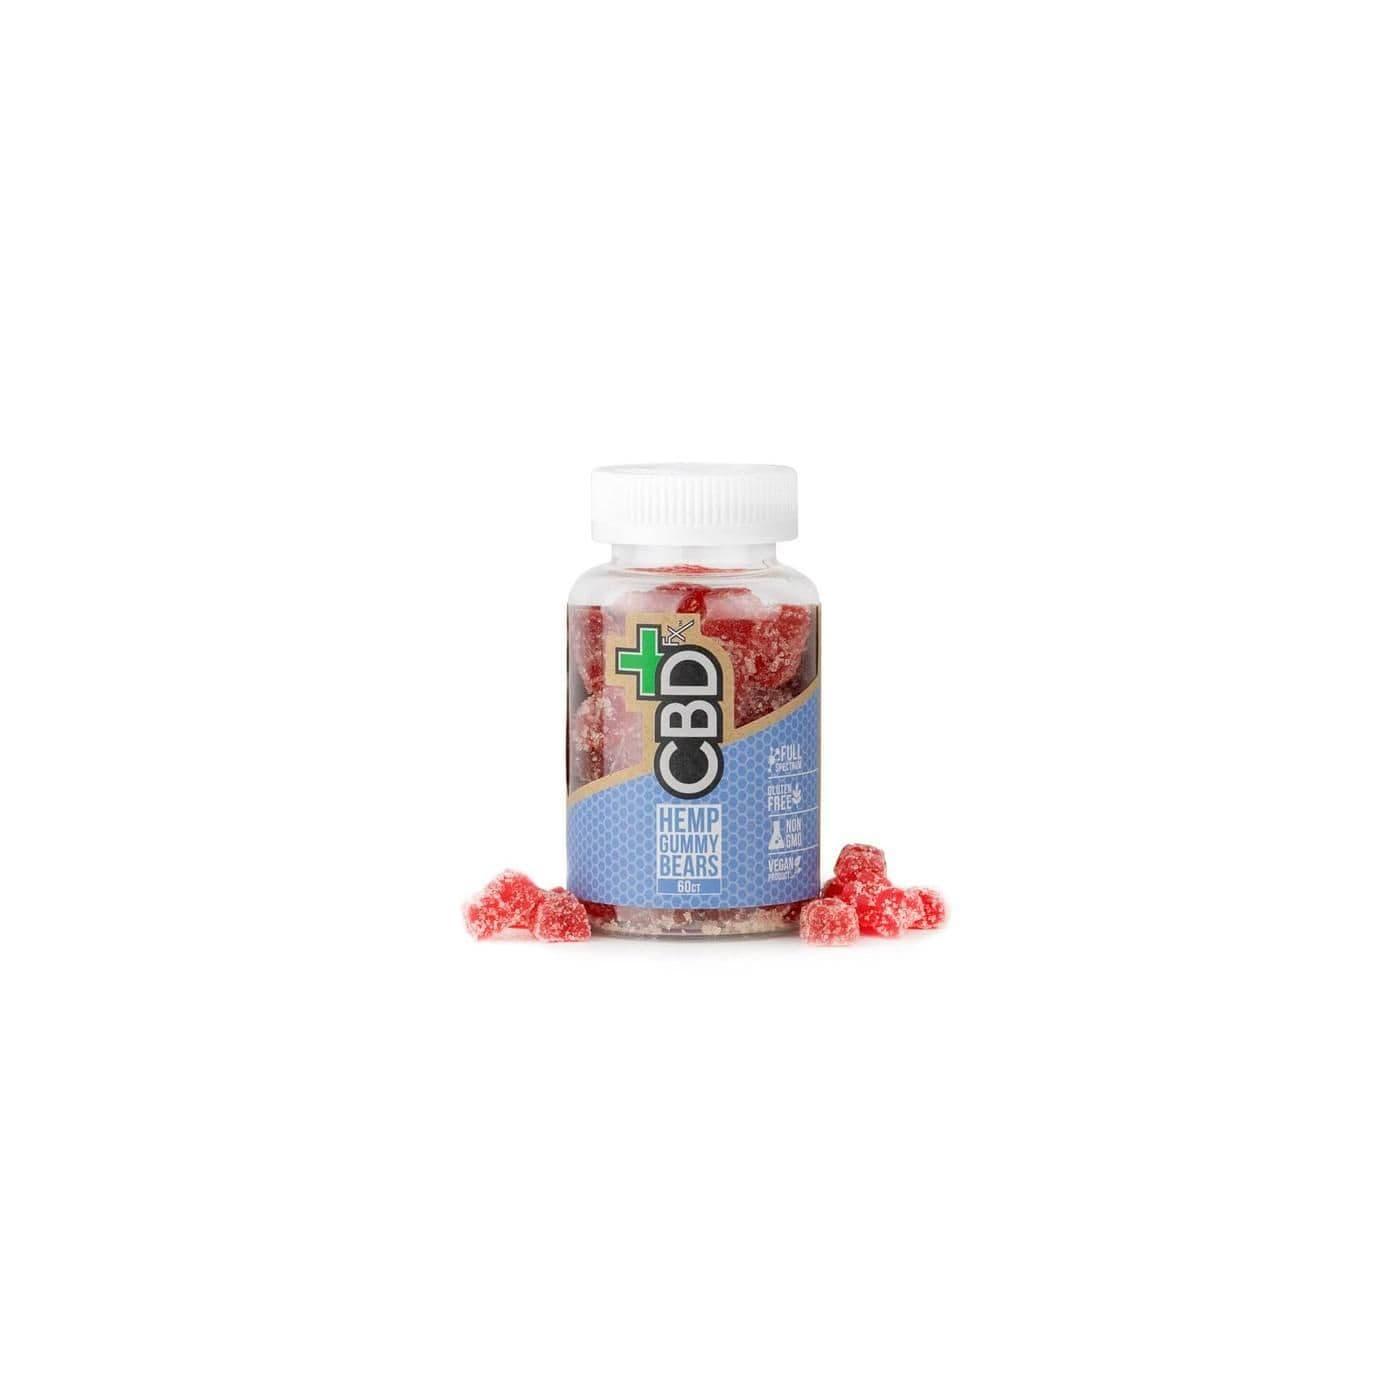 fx Gummies Bottle - 60 Count - 300 mg